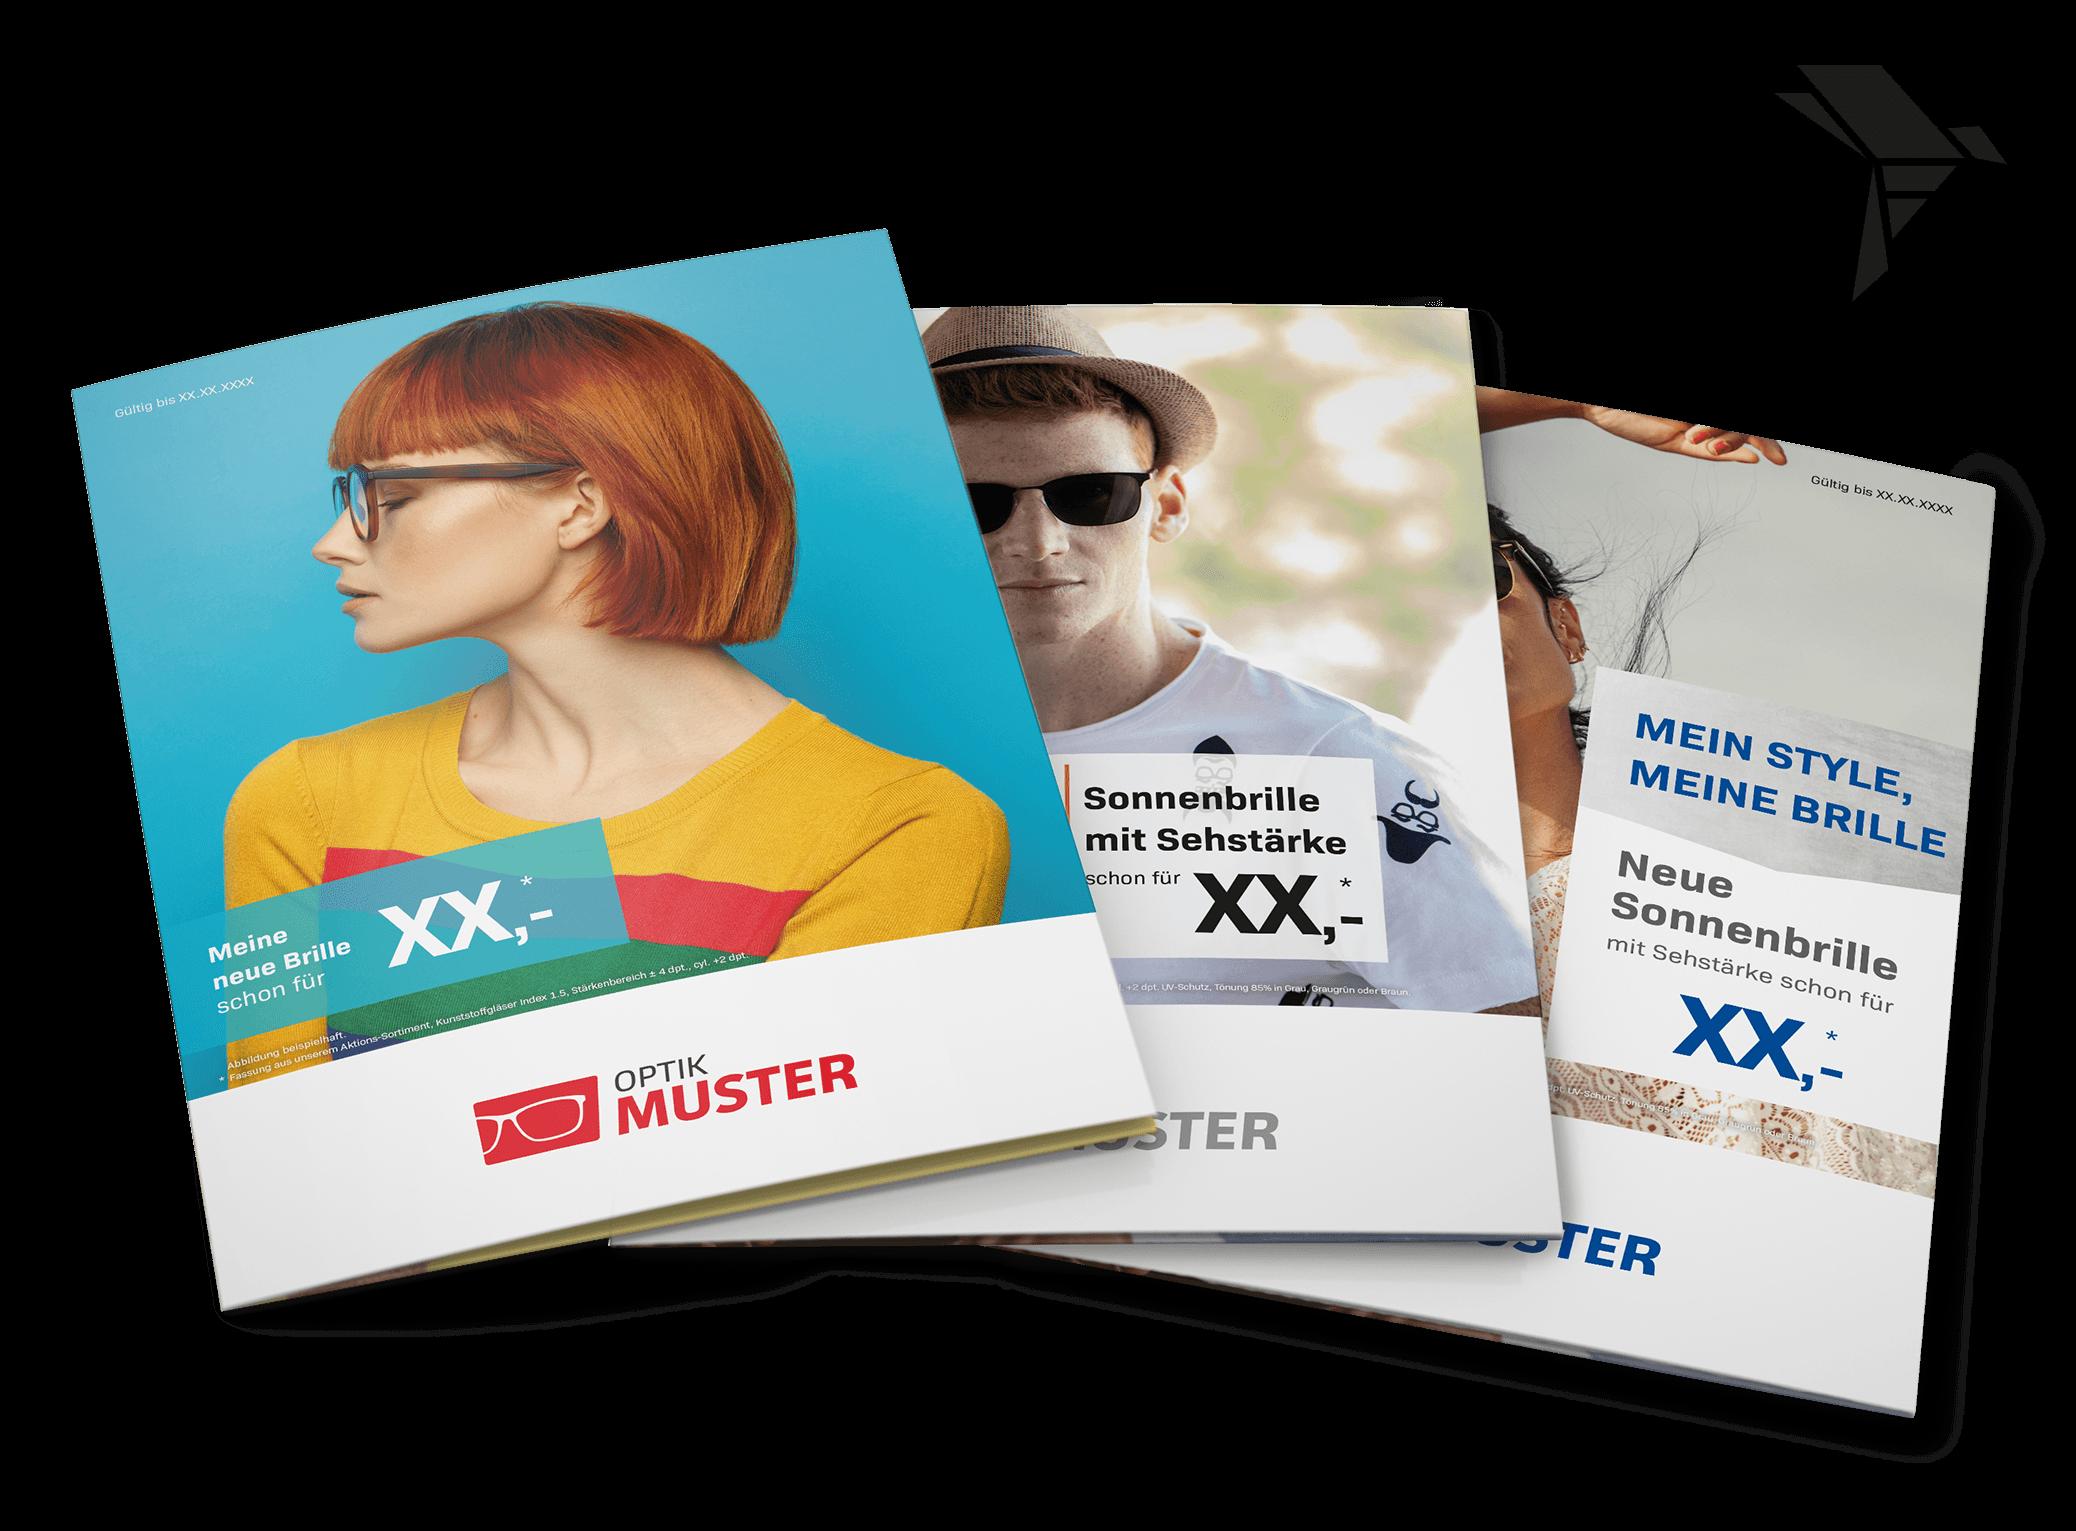 FREIFORM-Marketing-Werbung-Augenoptik